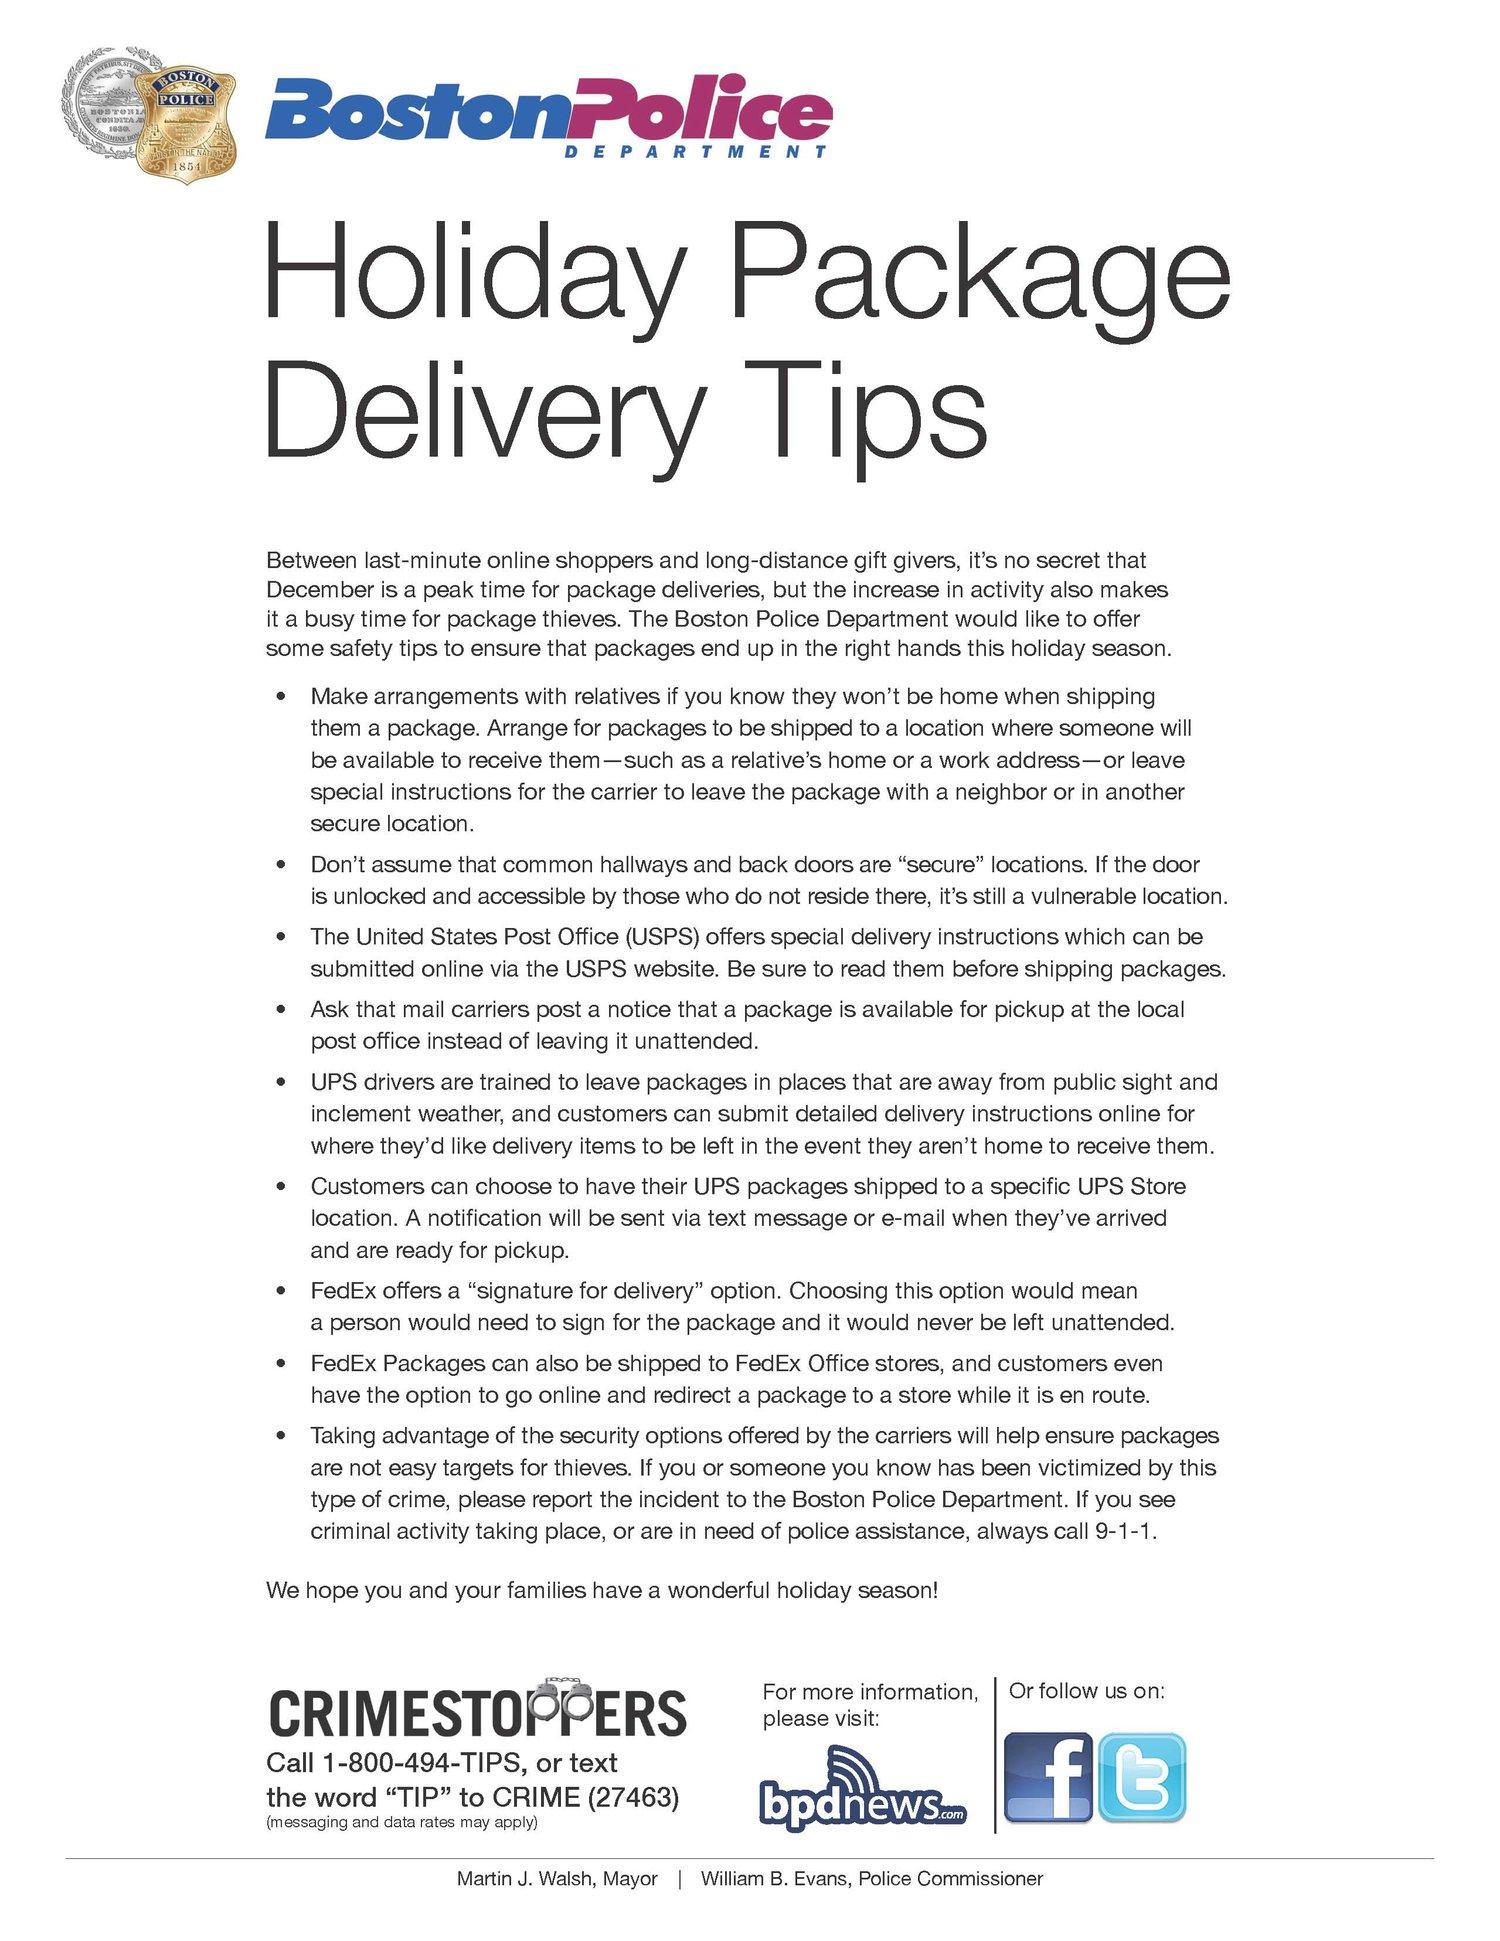 BPD Community Advisory: Holiday Package Theft — bpdnews com